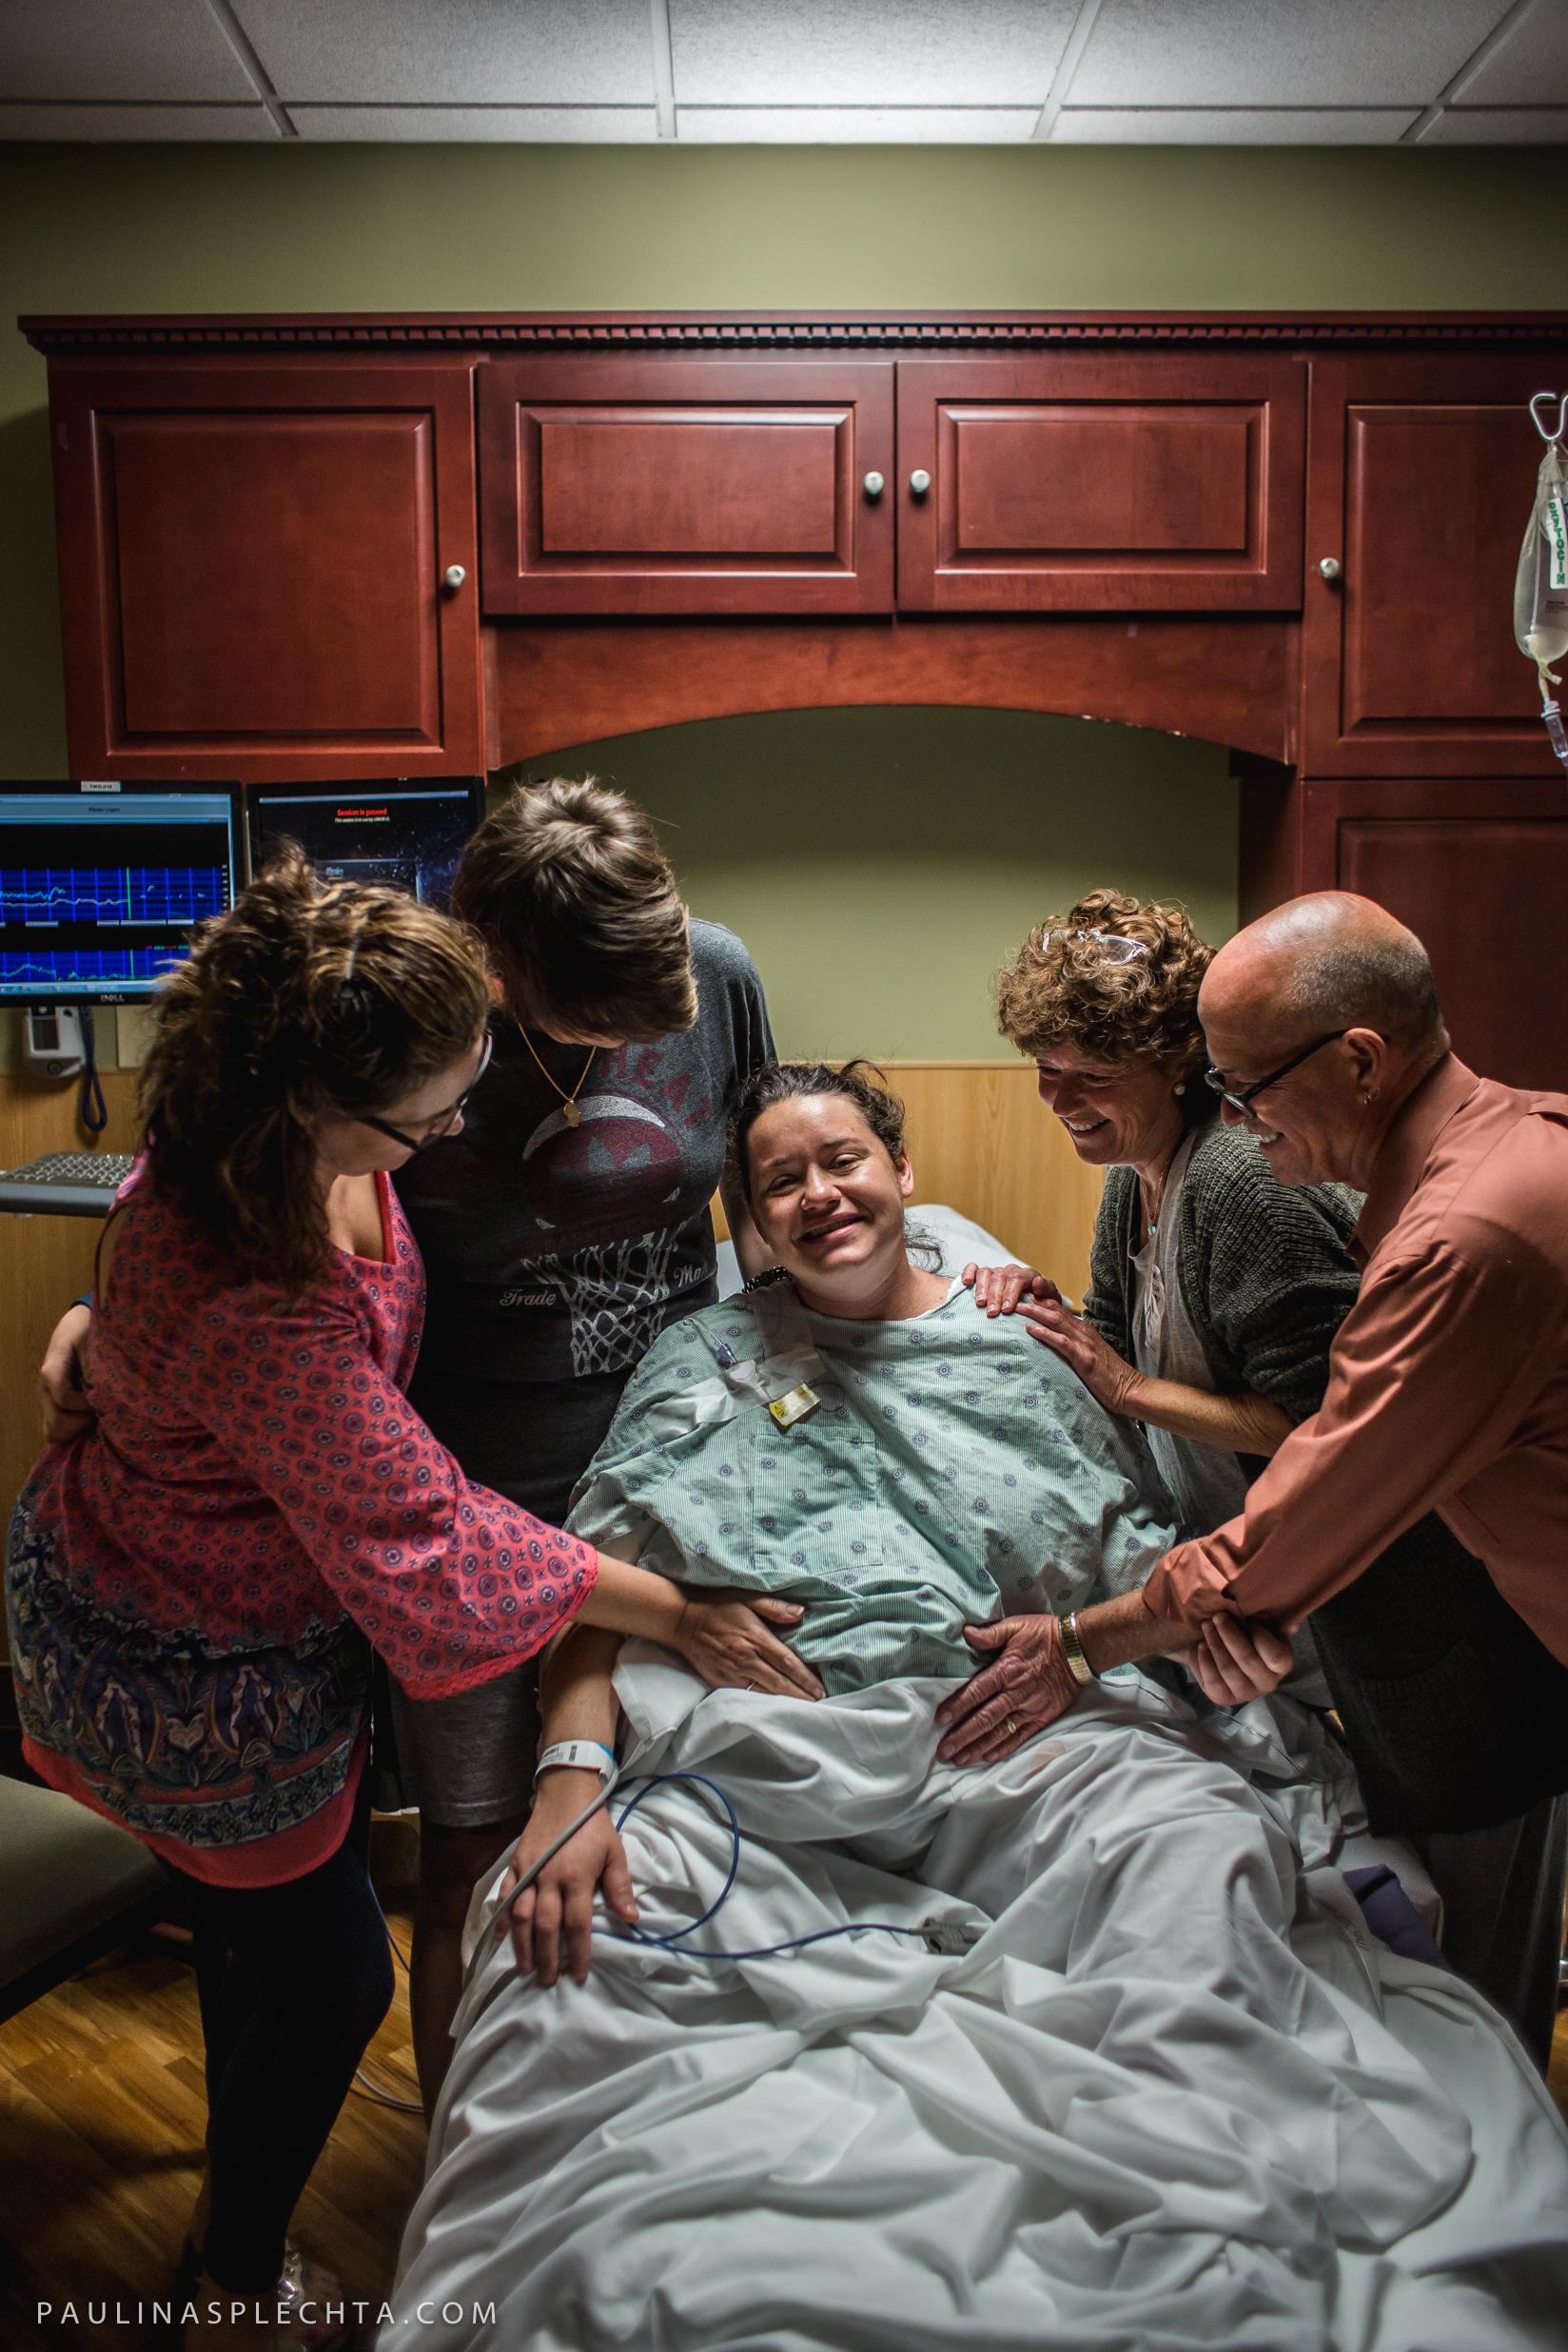 greenpath-baby-zika-babycenter-center-birth-photographer-miramar-go-into-labor-miami-boca-shelter-regional-pediatrician-broward-36-weeks-pregnant-haiti-hurricane-matthew-4.jpg